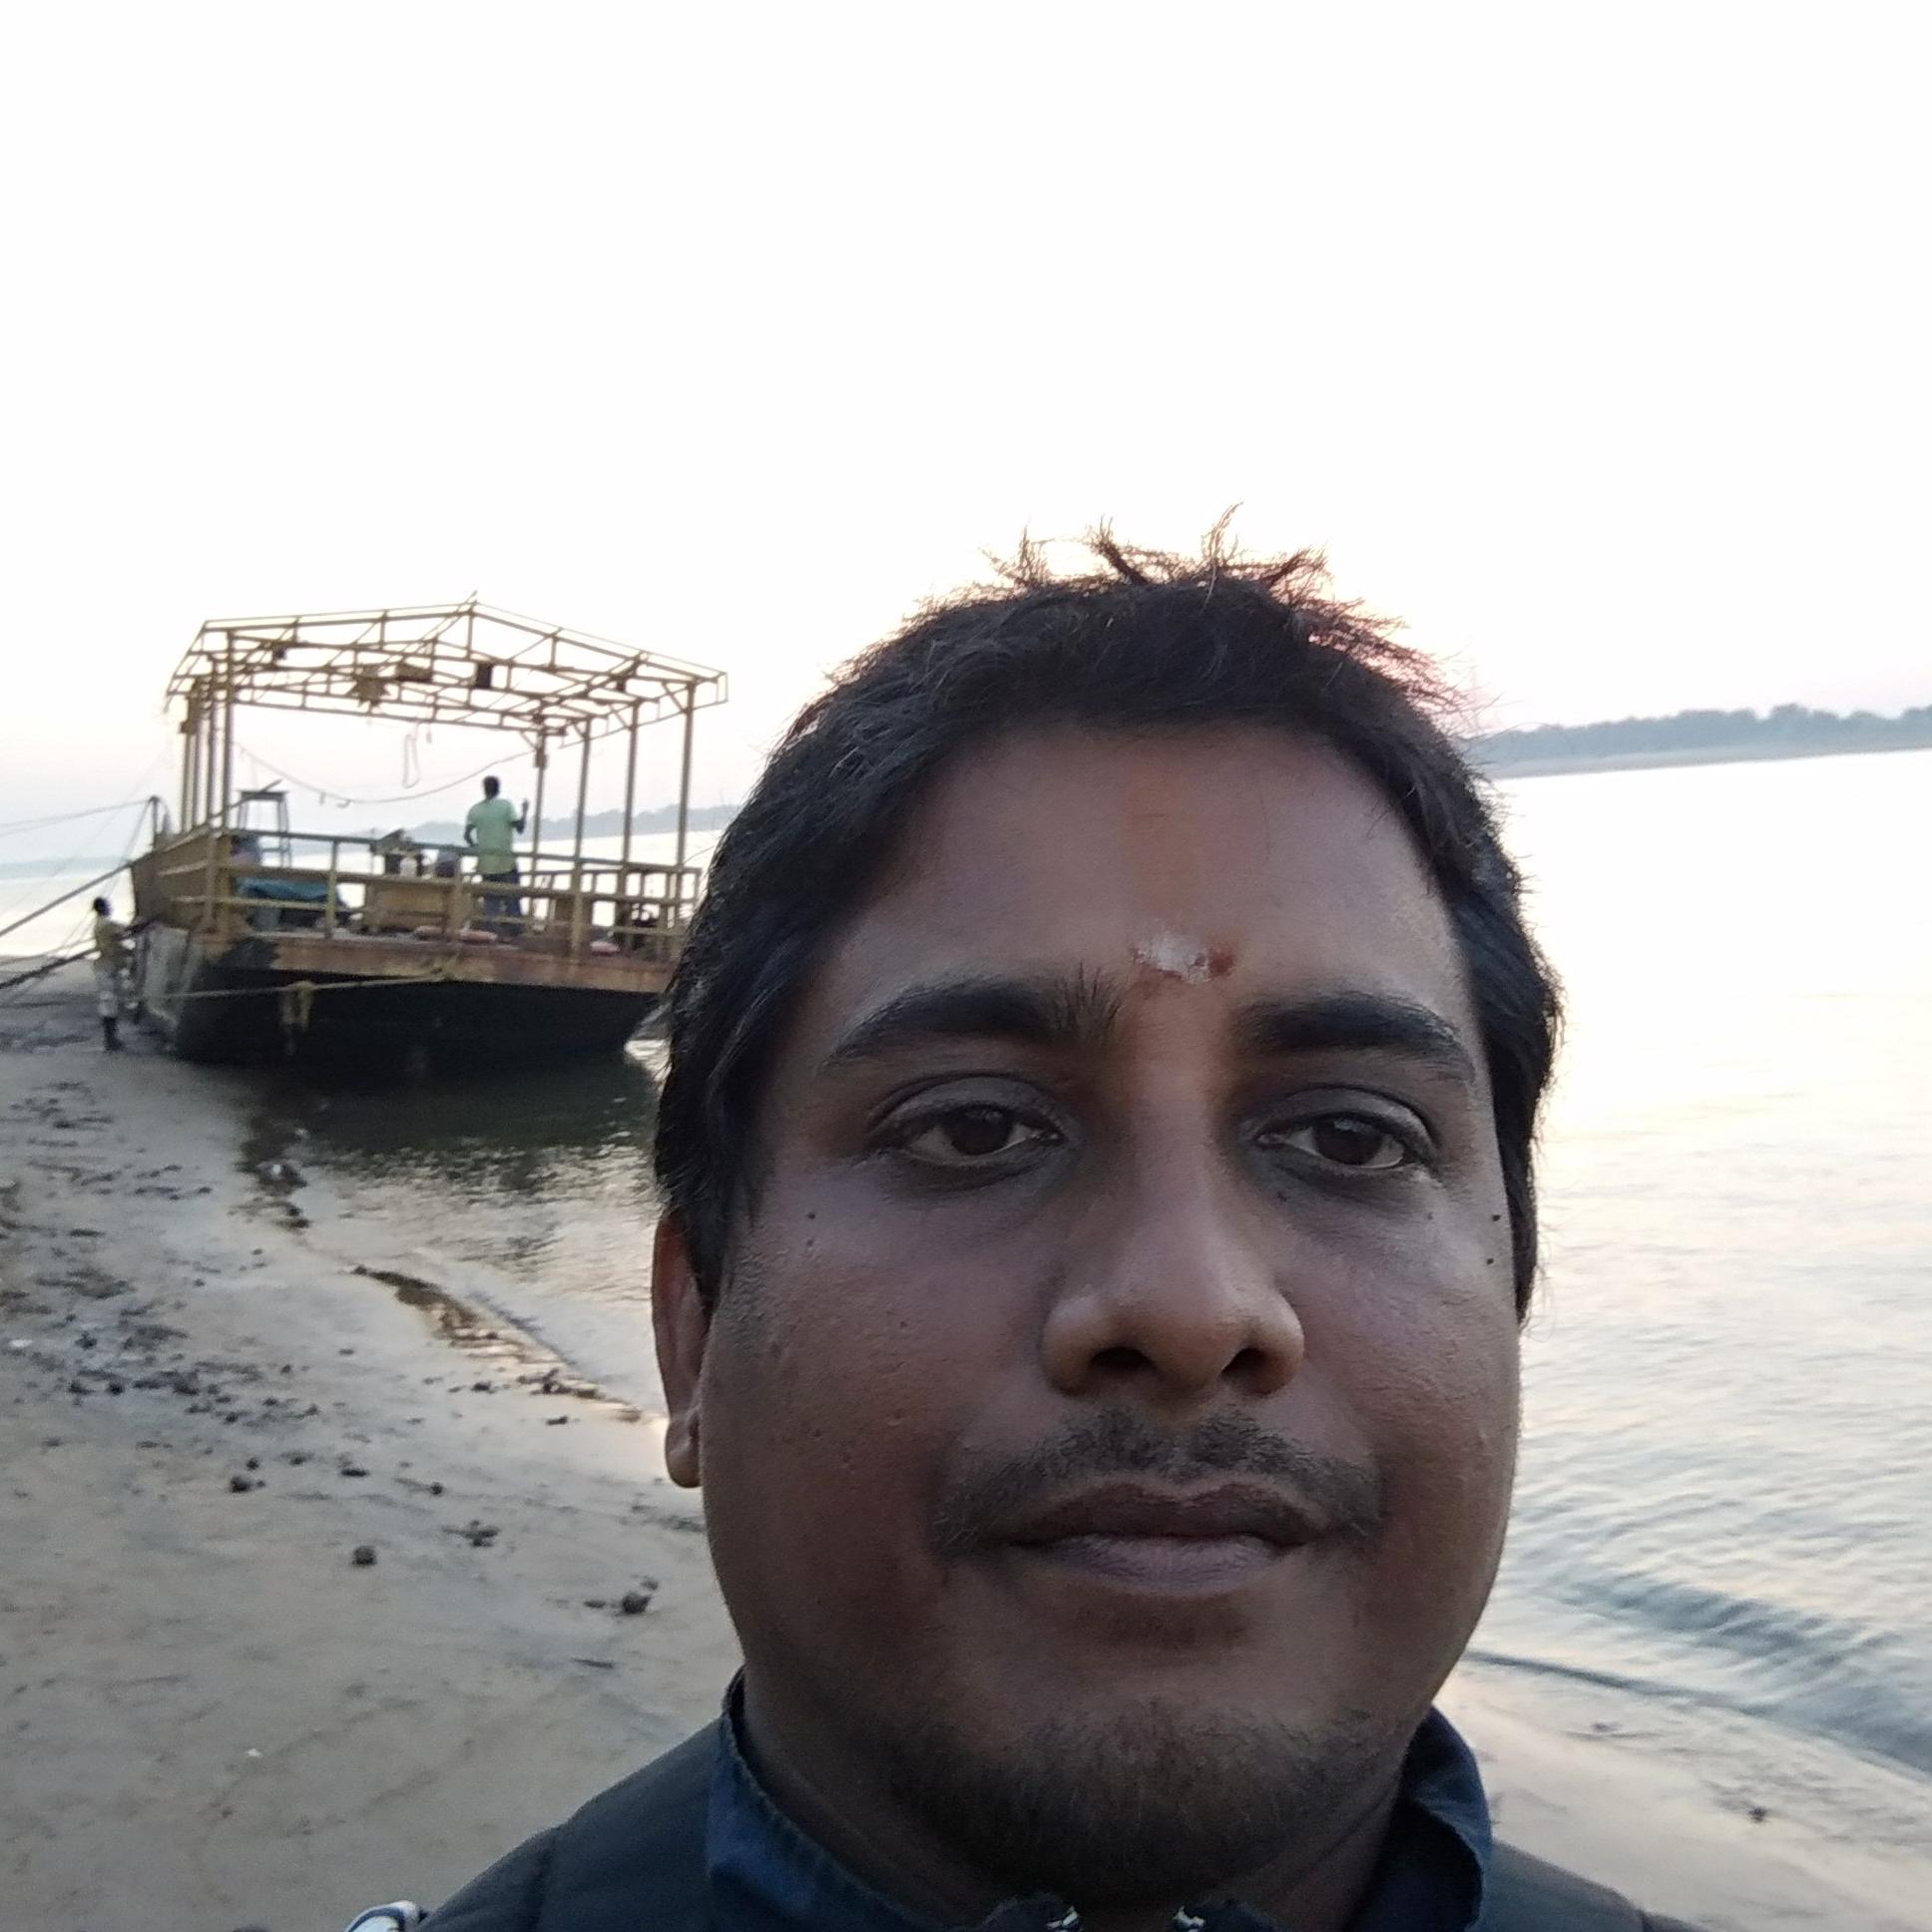 Bhagat Phool Singh Mahila Vishwavidyalaya Recruitment for Librarian, Librarian-HRDC, Sr. Lib. Asst & Library Attendant